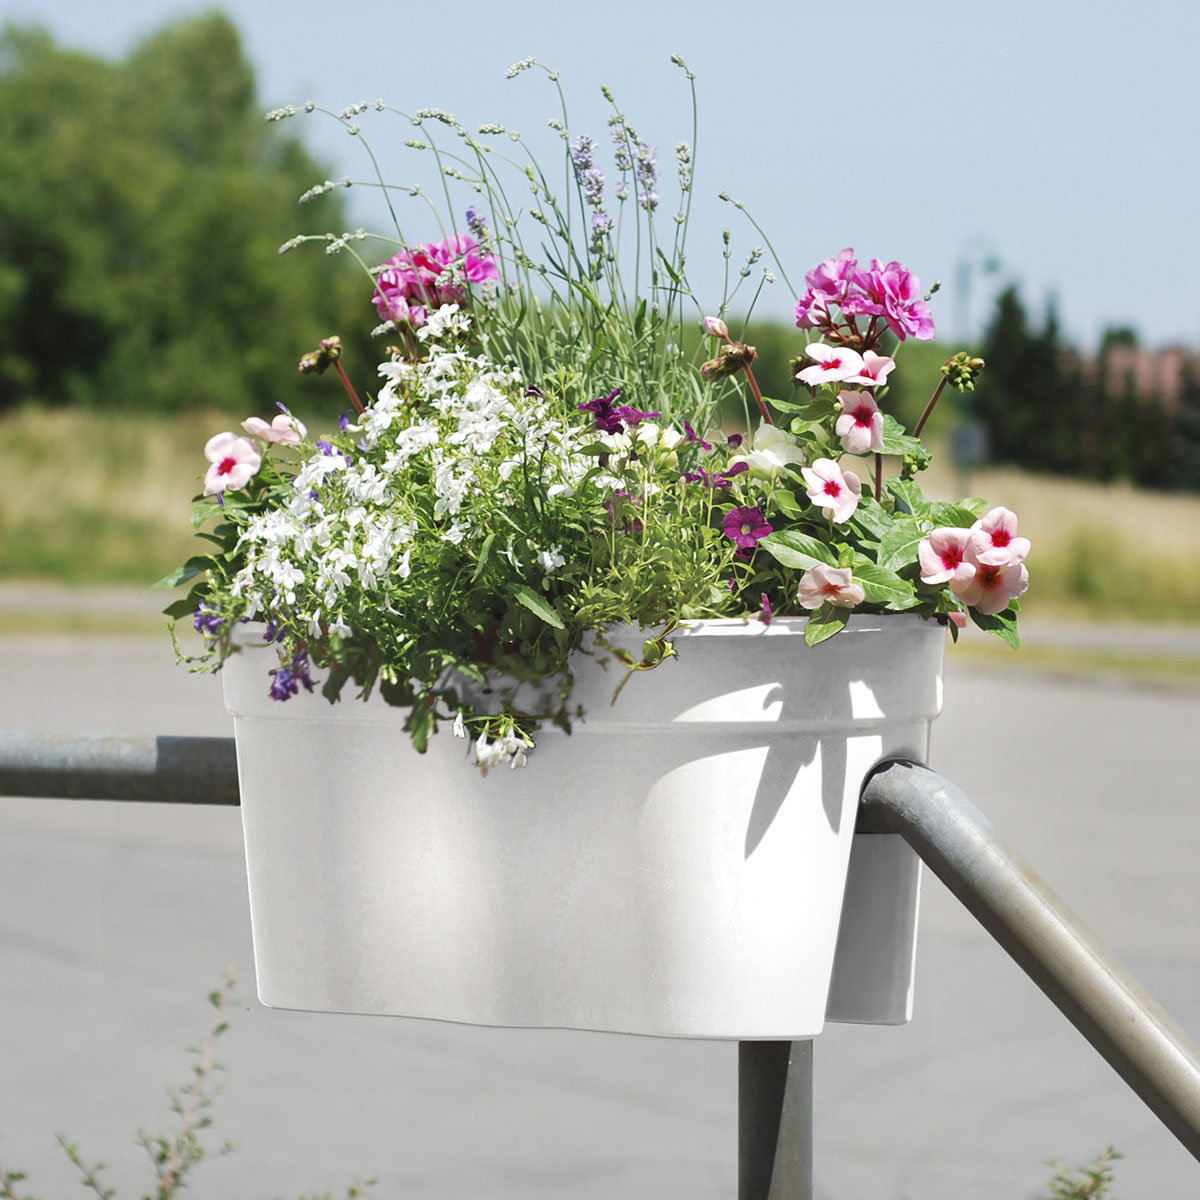 Geländertopf Flowerclip, 57,5 x 27,7 x 27 cm, weiß | #2